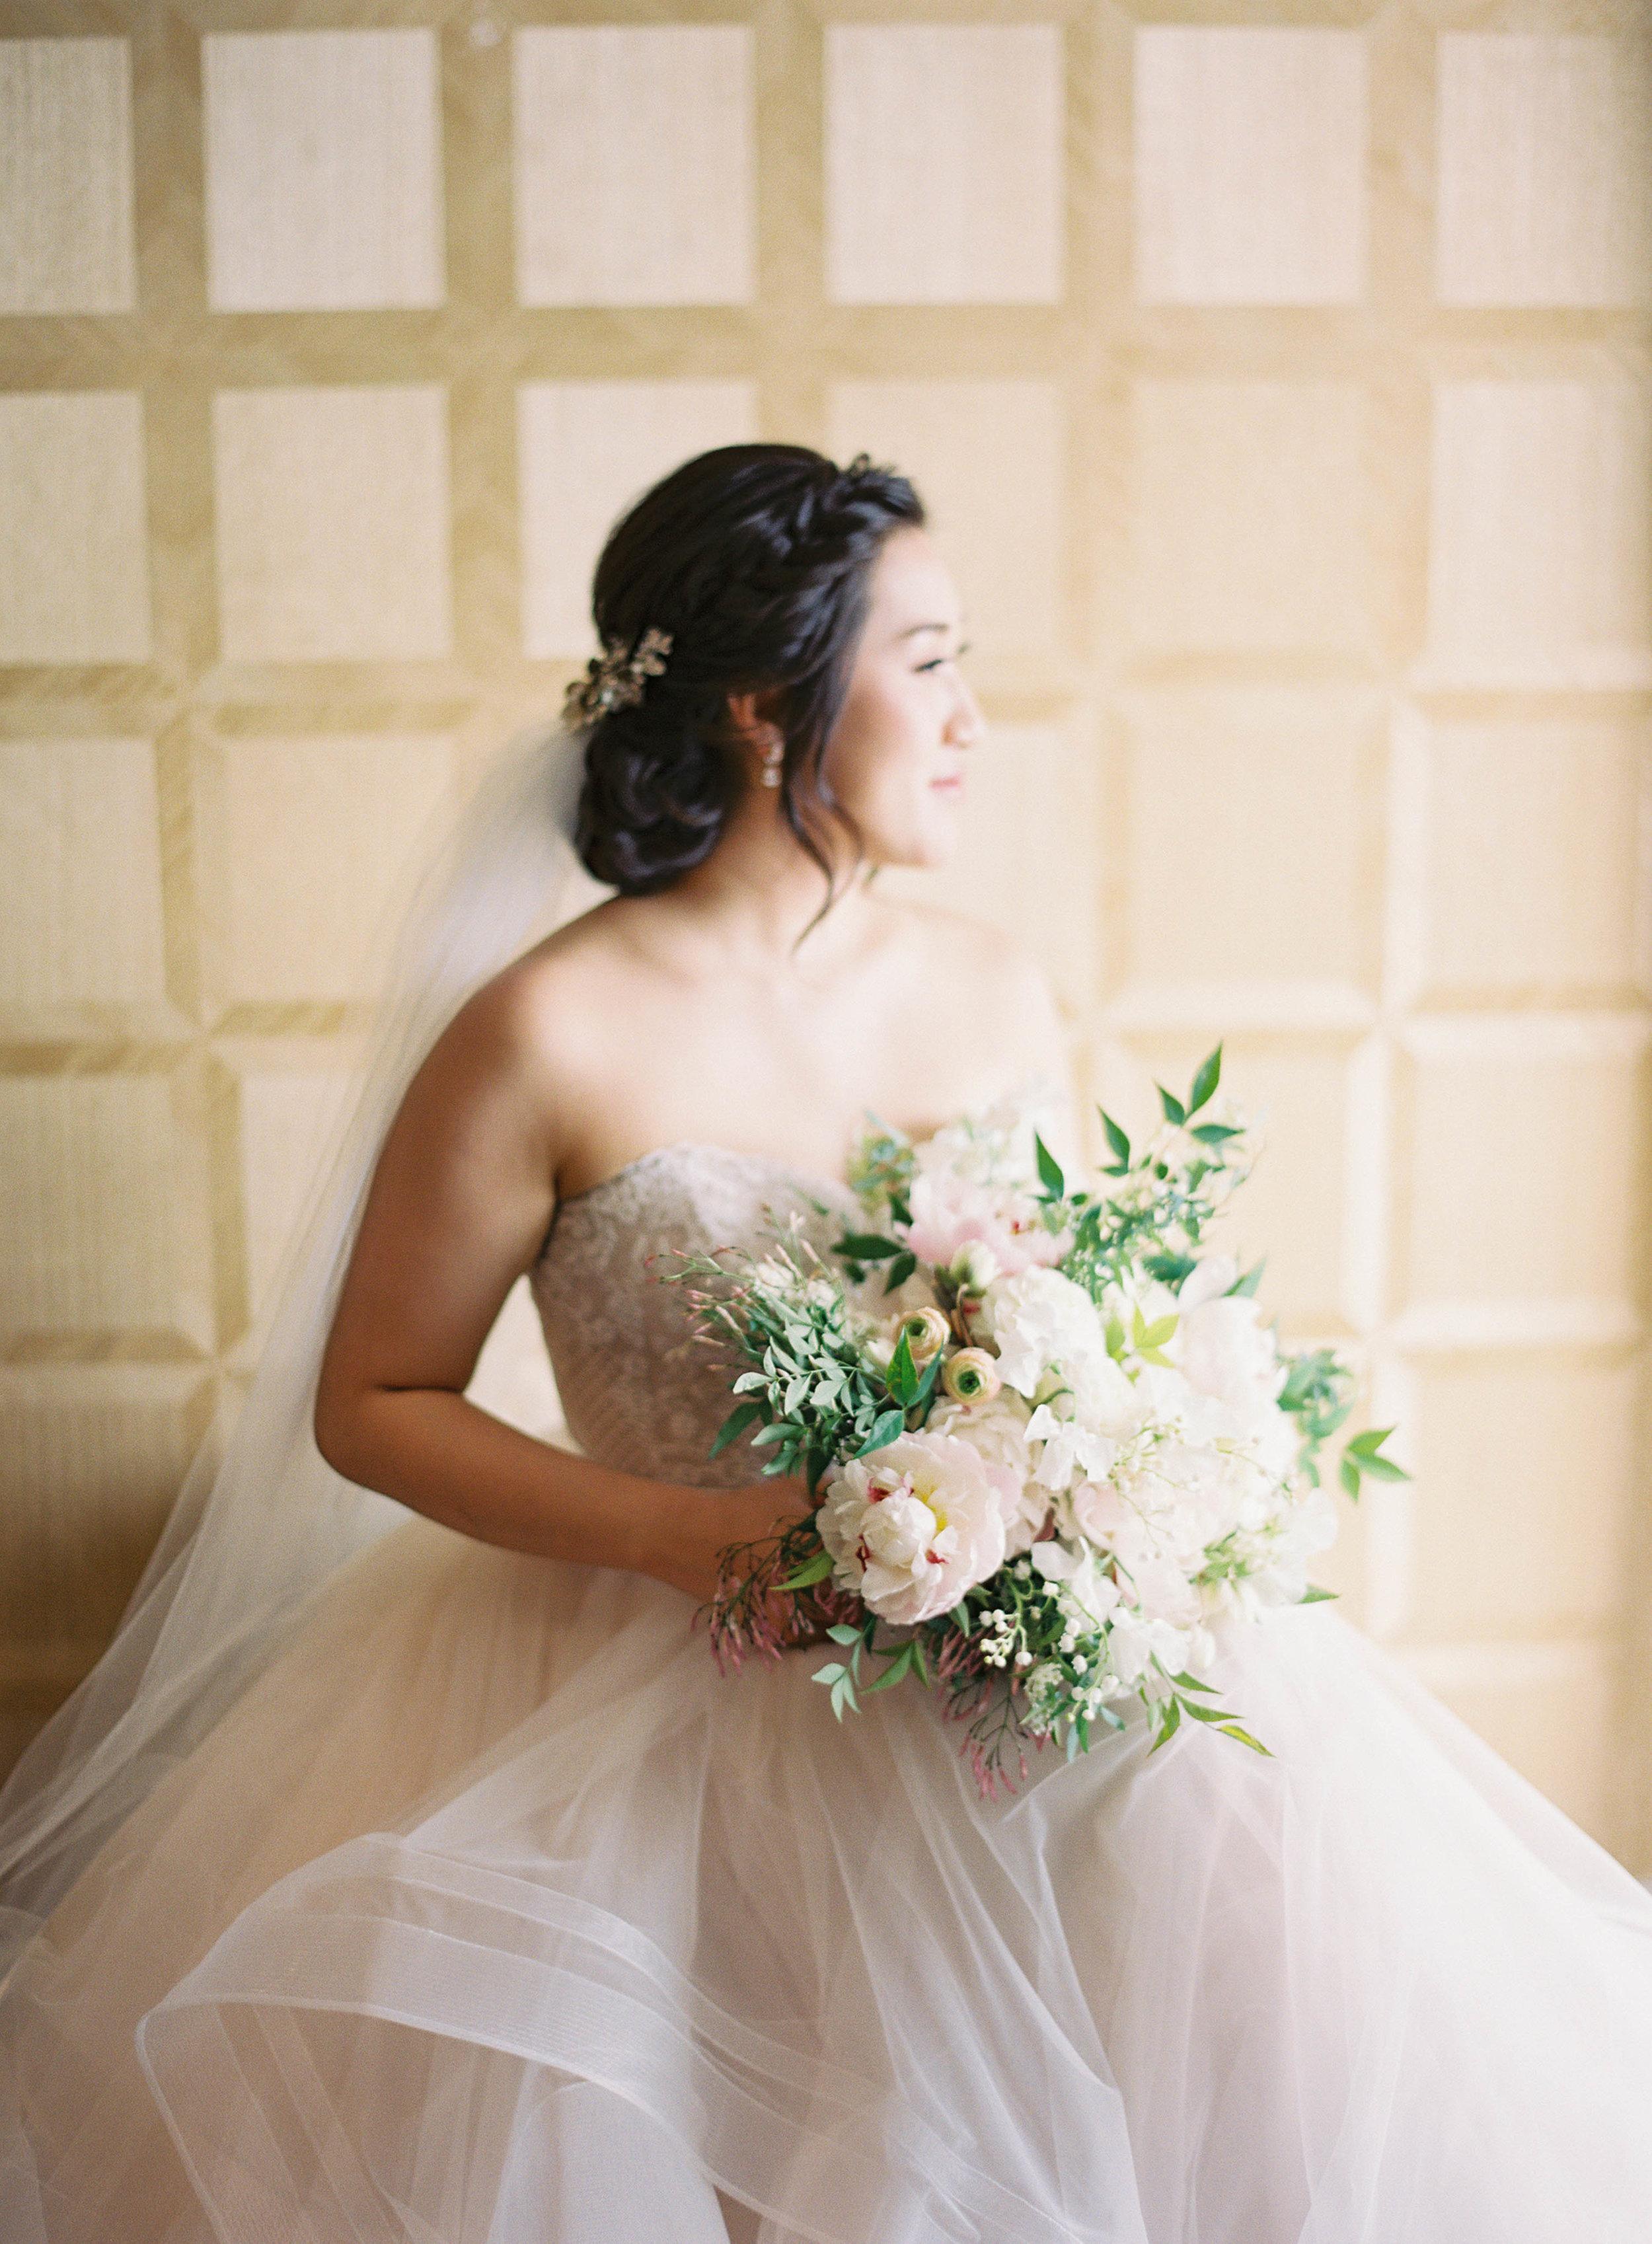 JS-Editorial-33-Jen-Huang-003034-R1-010.jpg